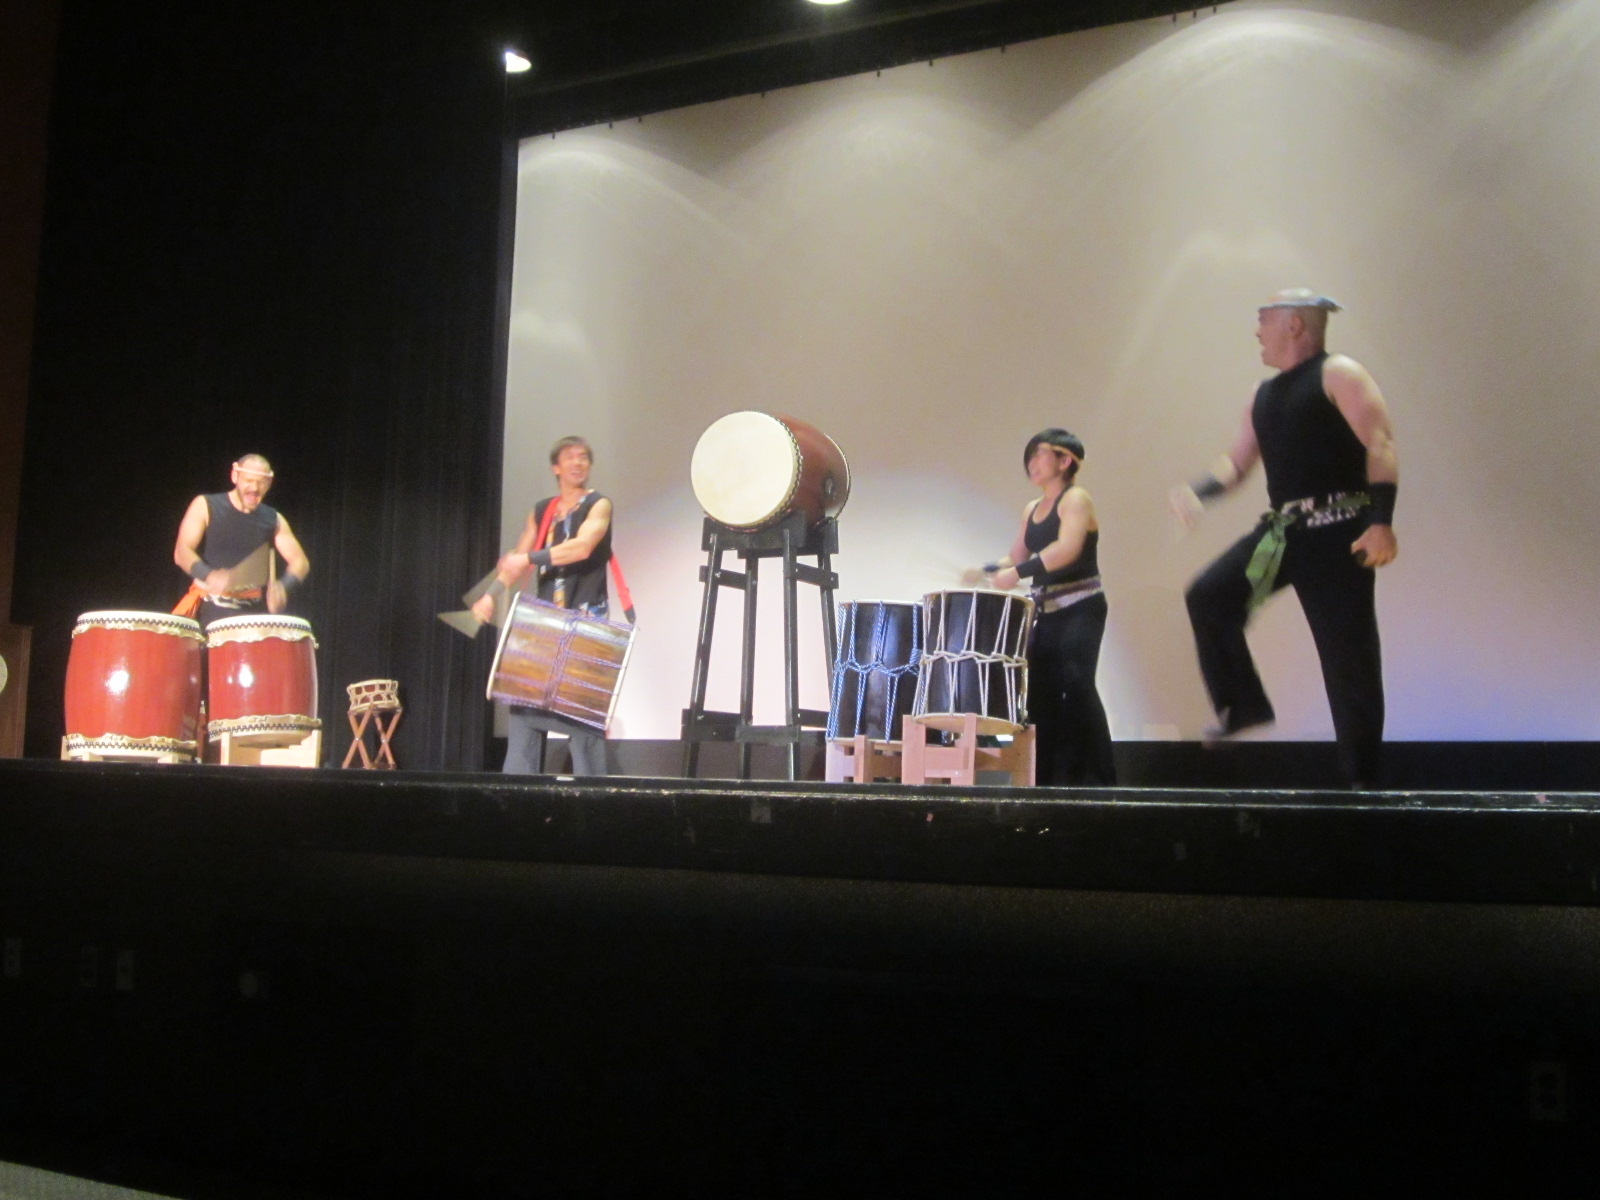 Taiko Performance by Kizuna and Ryo Shimamoto